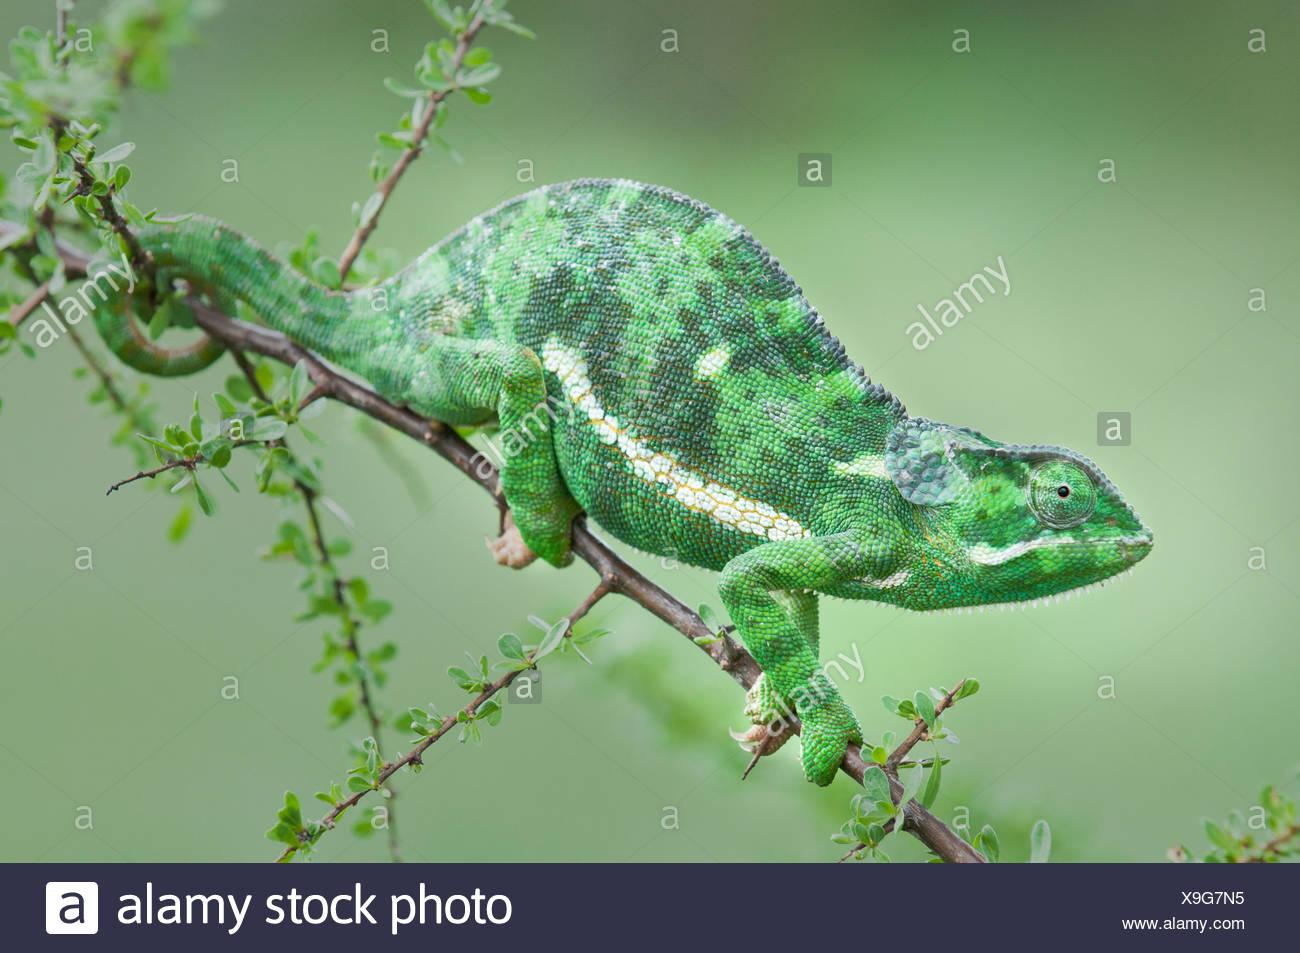 Adult Flap-necked Chameleon on Acacia bush, Ndutu Safari Lodge, Ngorongoro Conservation Area, Tanzania. - Stock Image